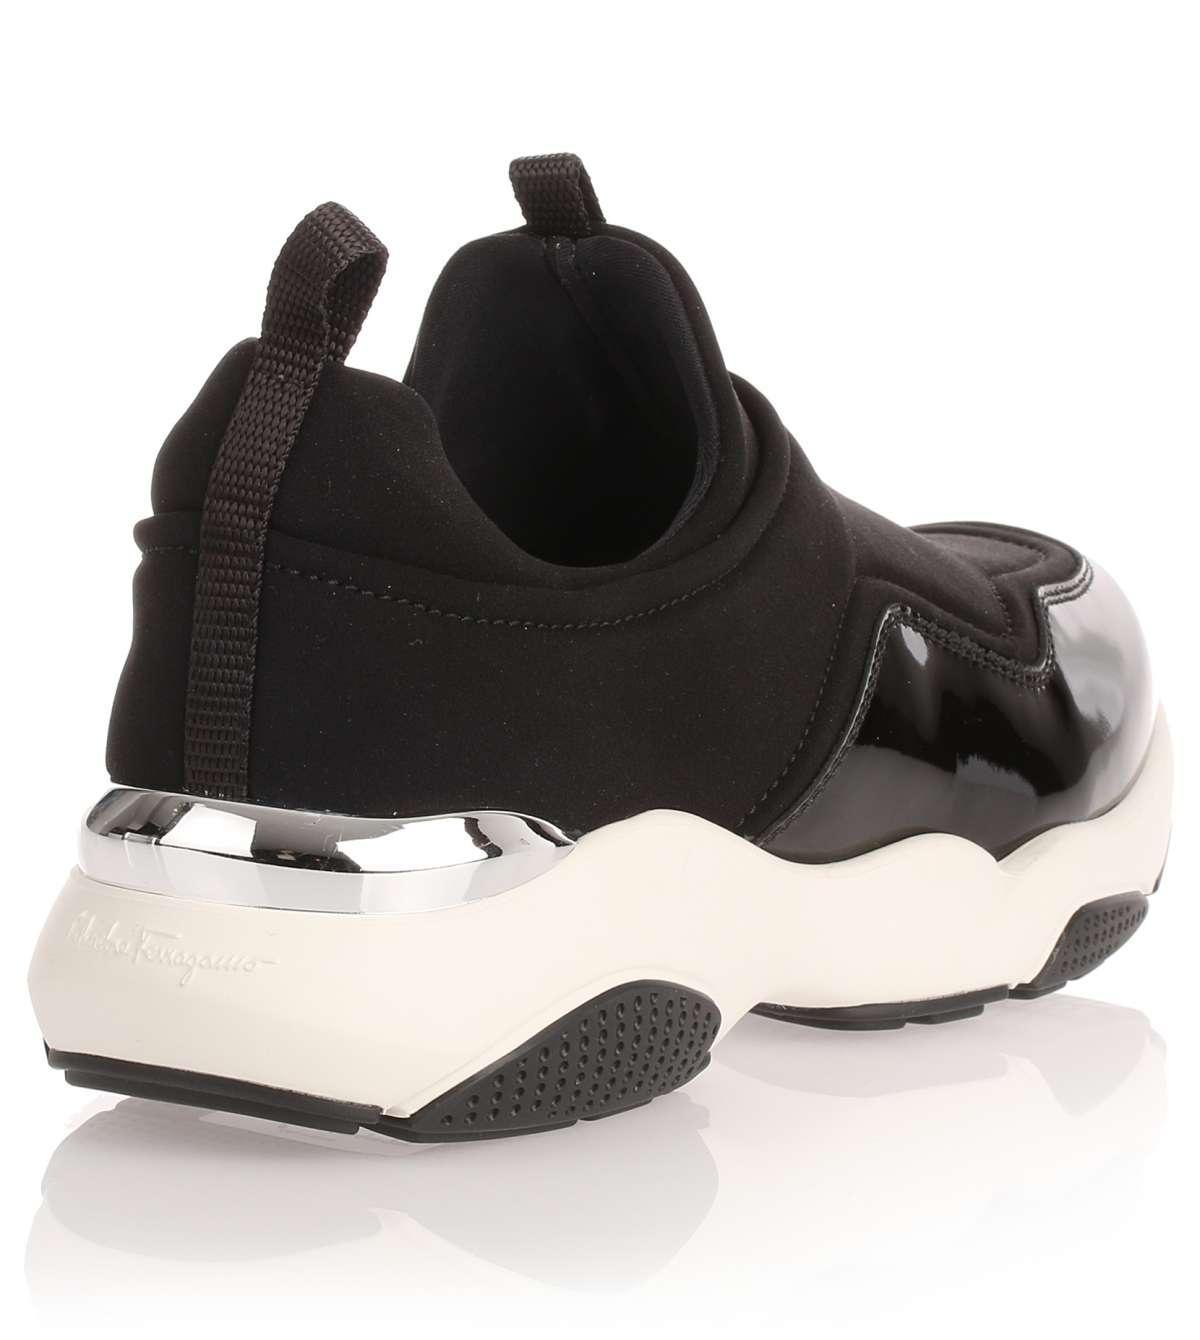 Giolly black fabric and patent leather sneaker Salvatore Ferragamo 6uMP7Uy